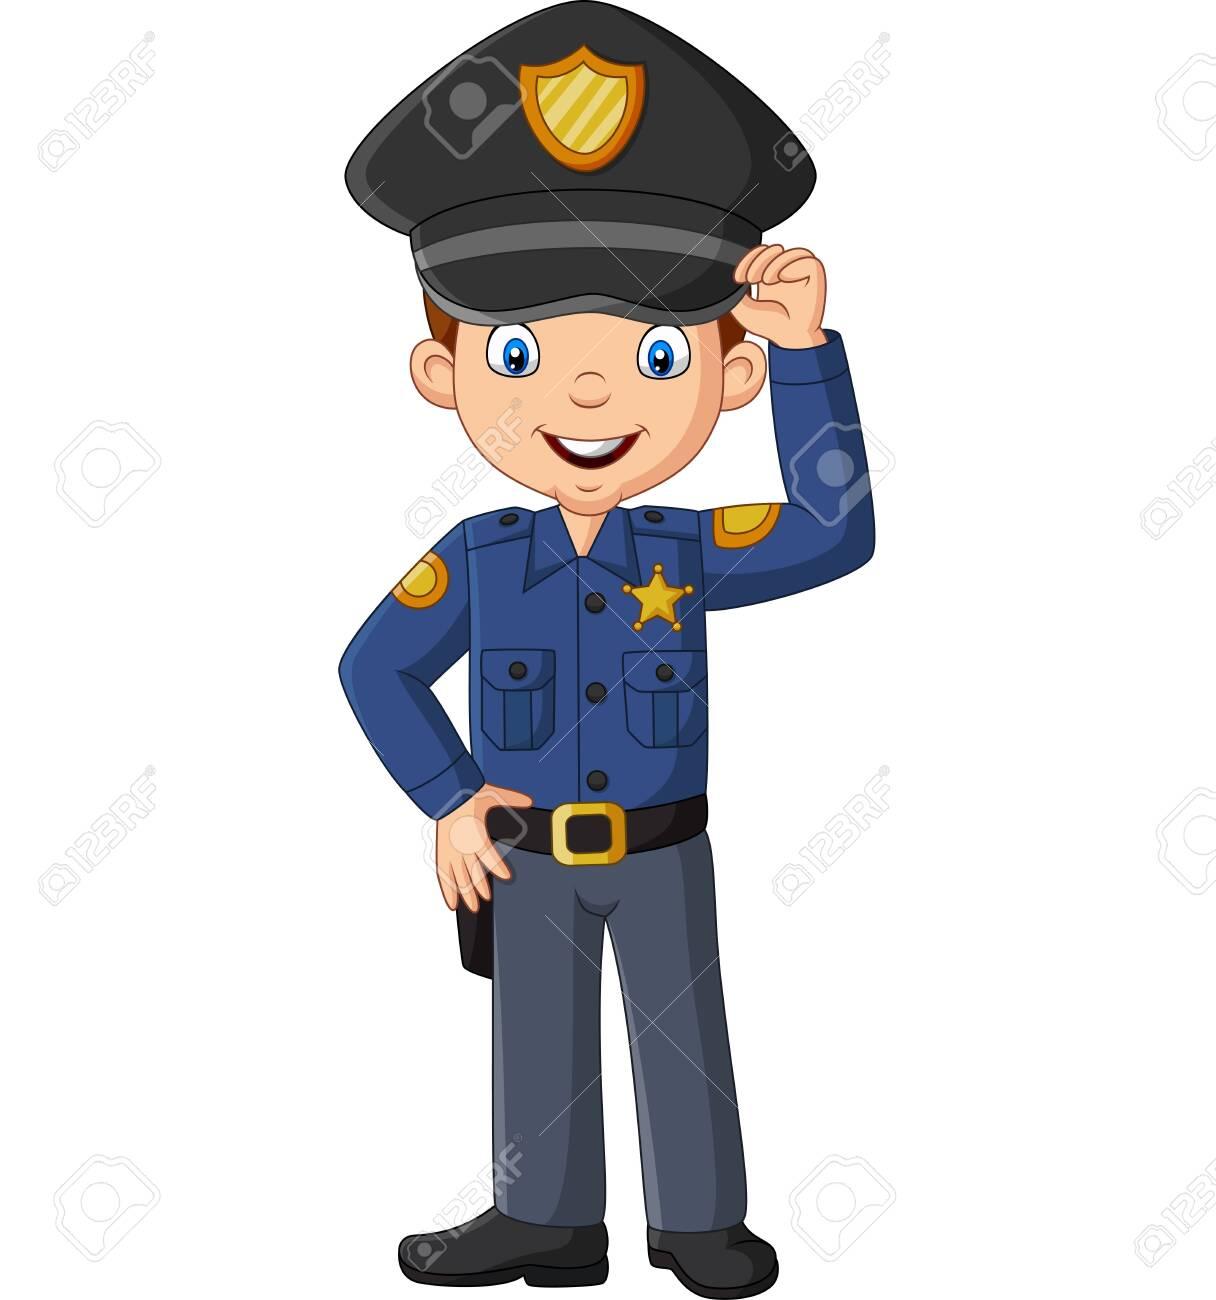 Vector illustration of Cartoon smiling officer policeman standing - 136173027